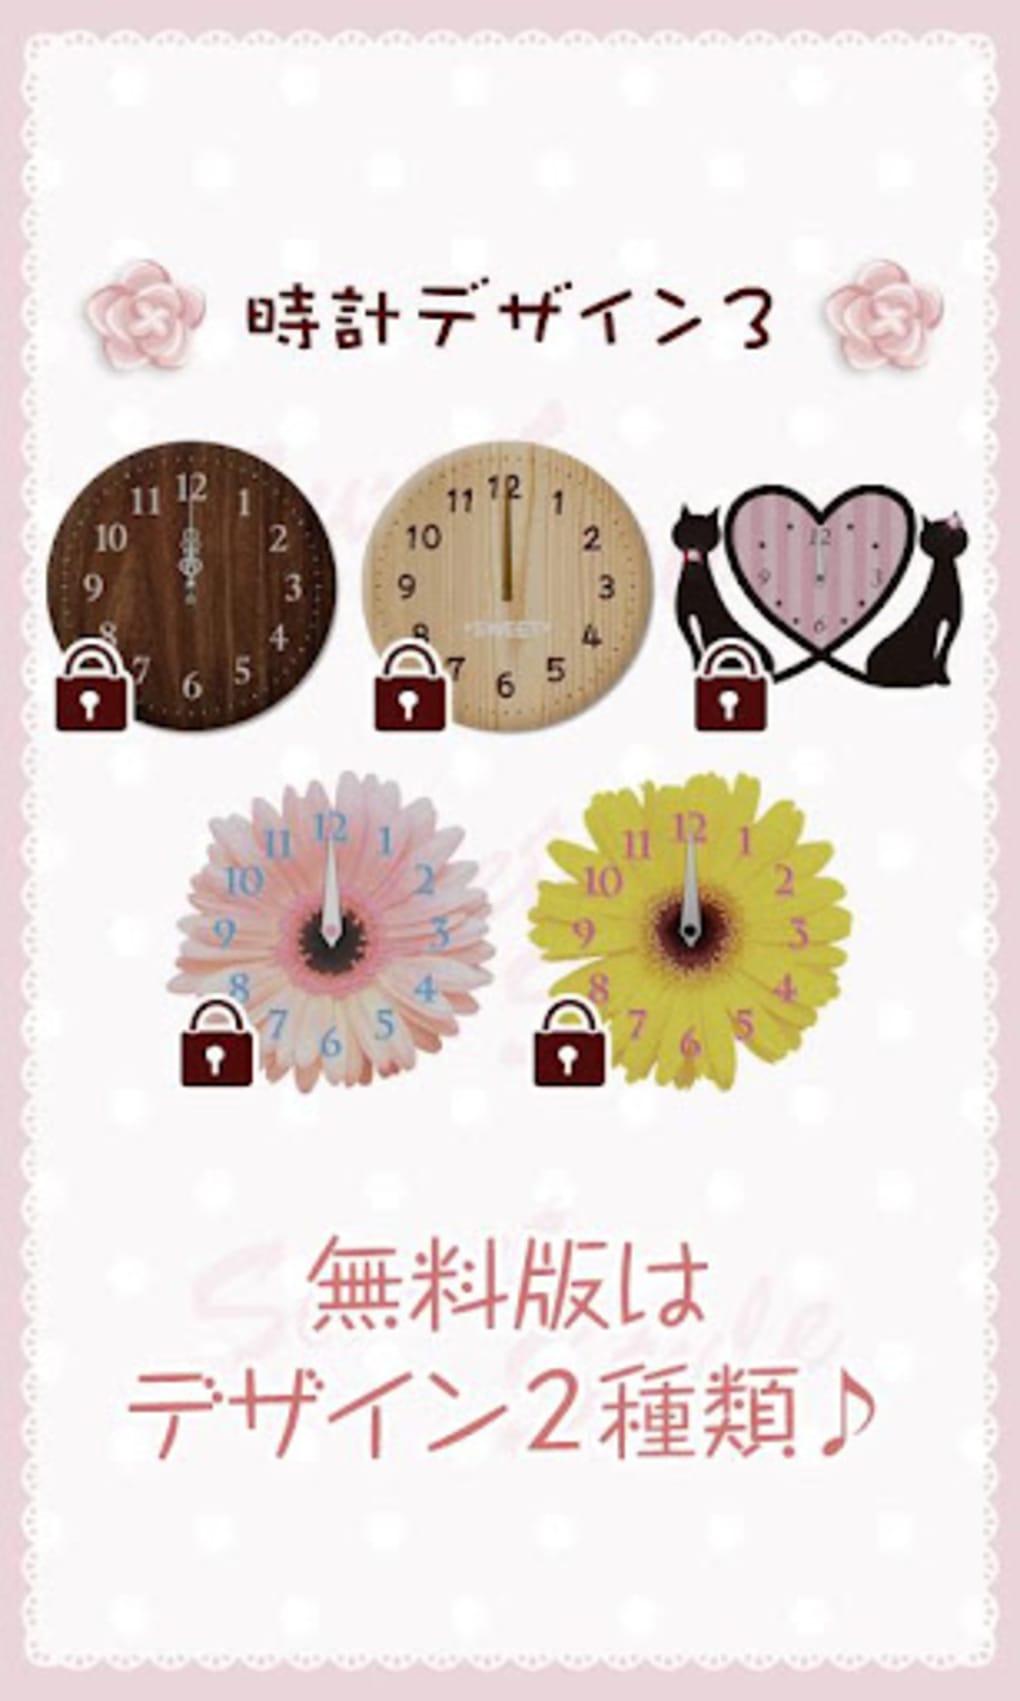 Analog Clock - シンプル時計」をApp Storeで